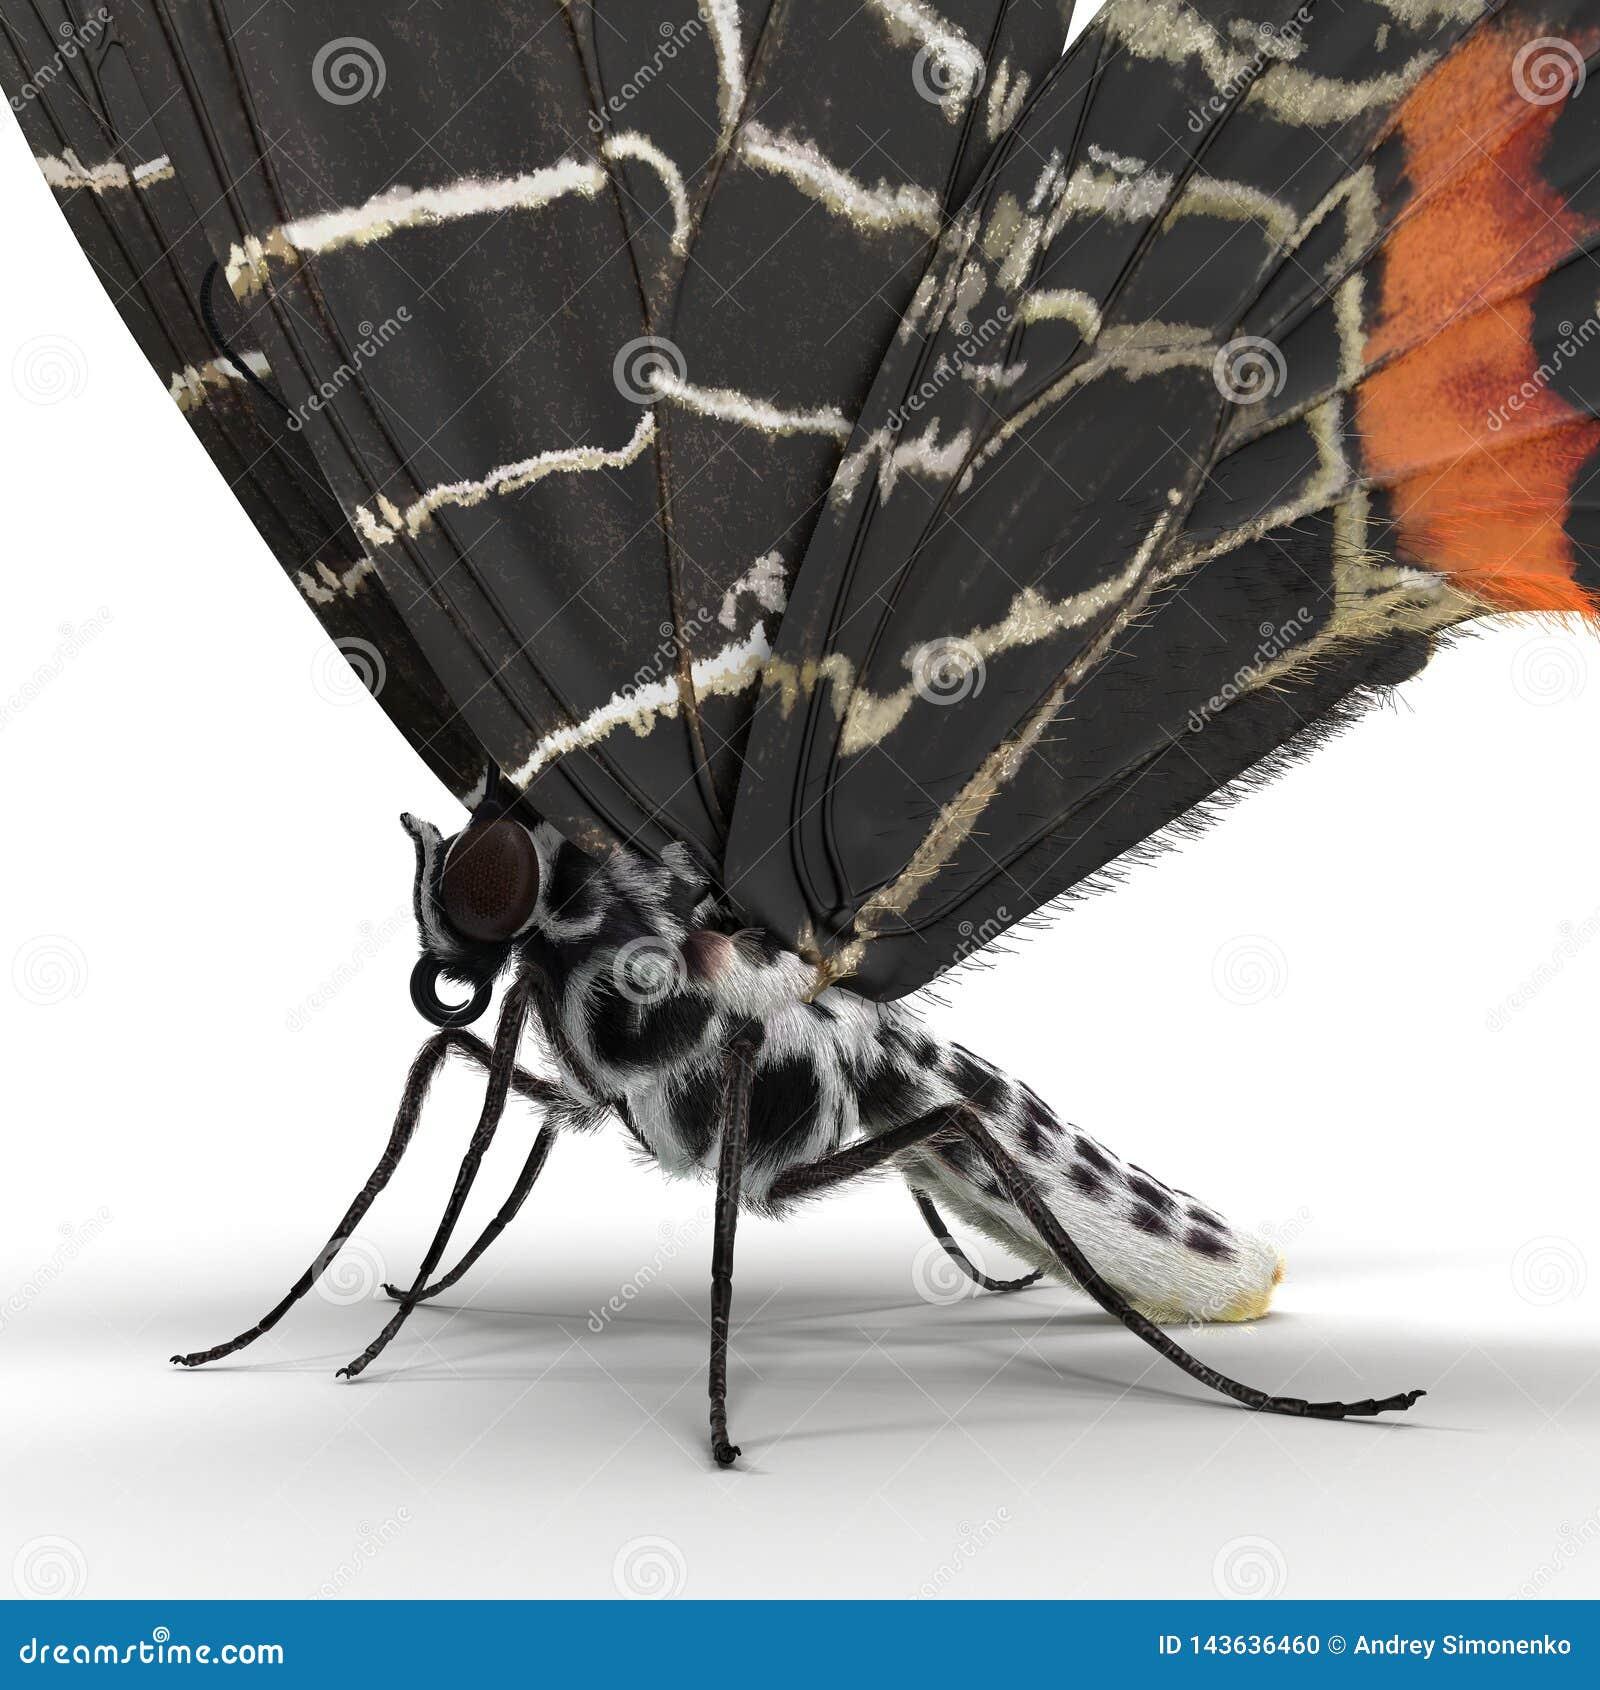 Bhutanitis Lidderdalii or Bhutan Glory Butterfly Swallowtail Isolated on White Background 3D Illustration